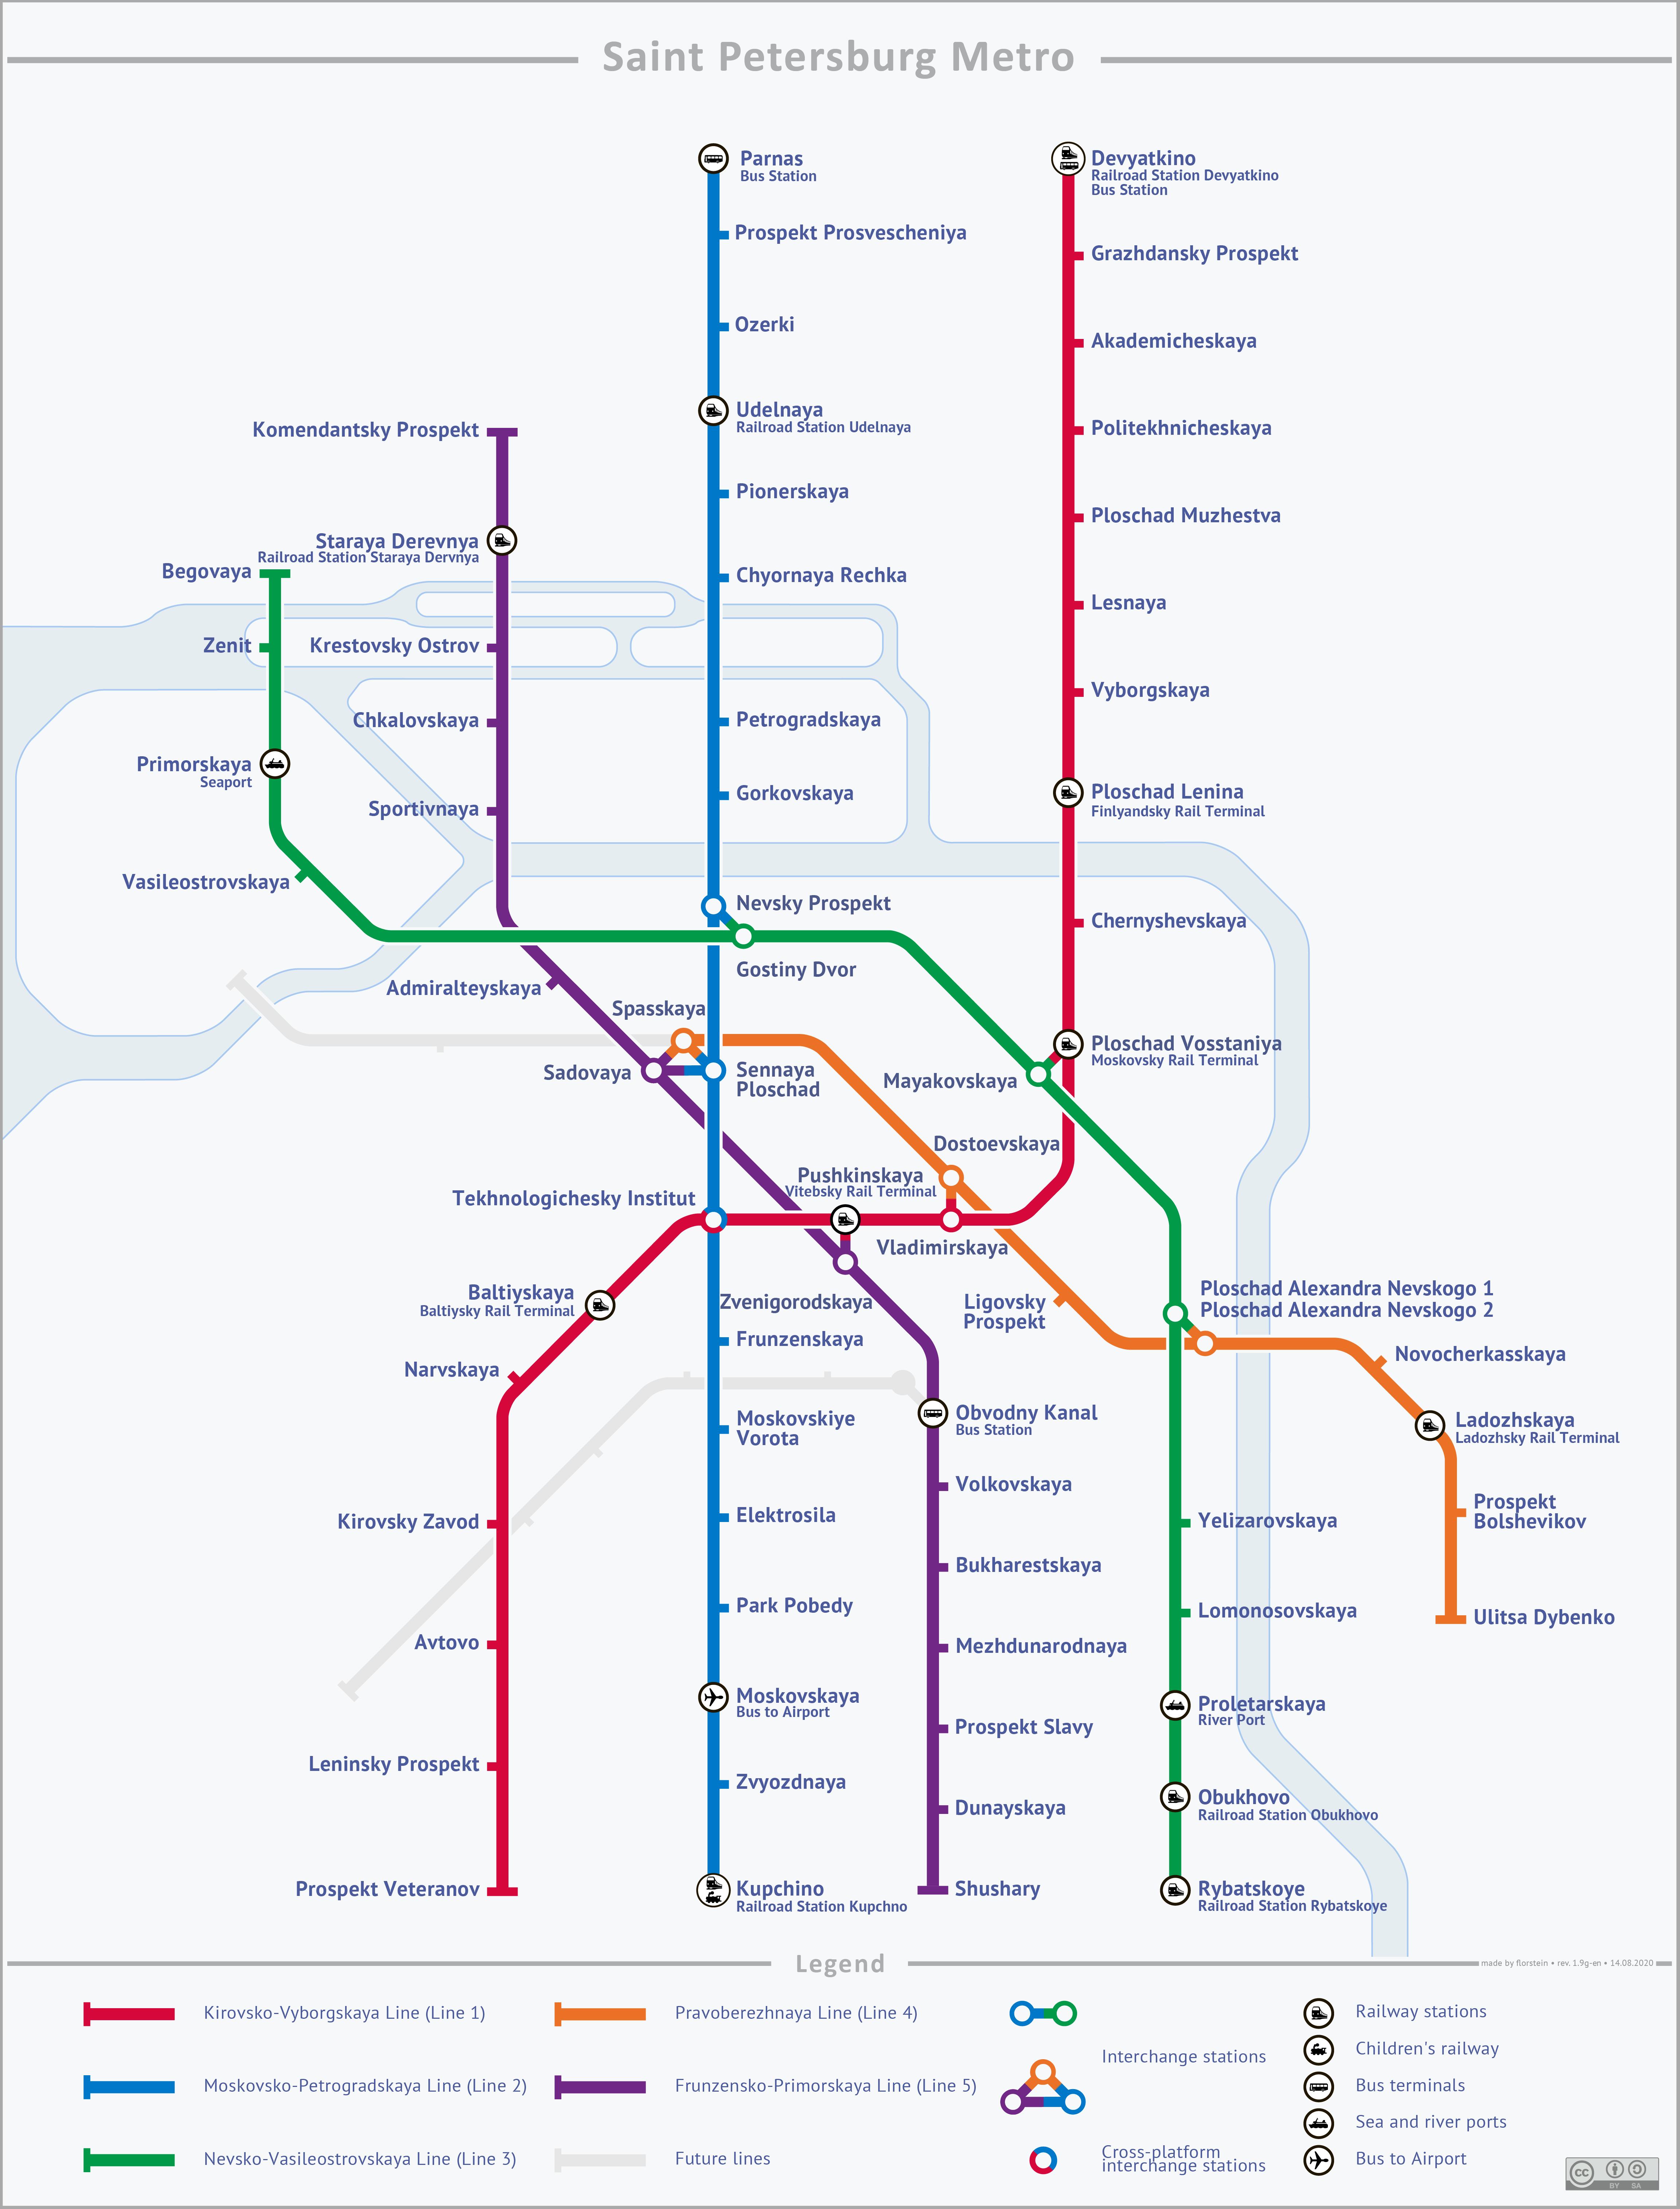 Saint Petersburg Russia Subway Map.List Of Saint Petersburg Metro Stations Wikipedia